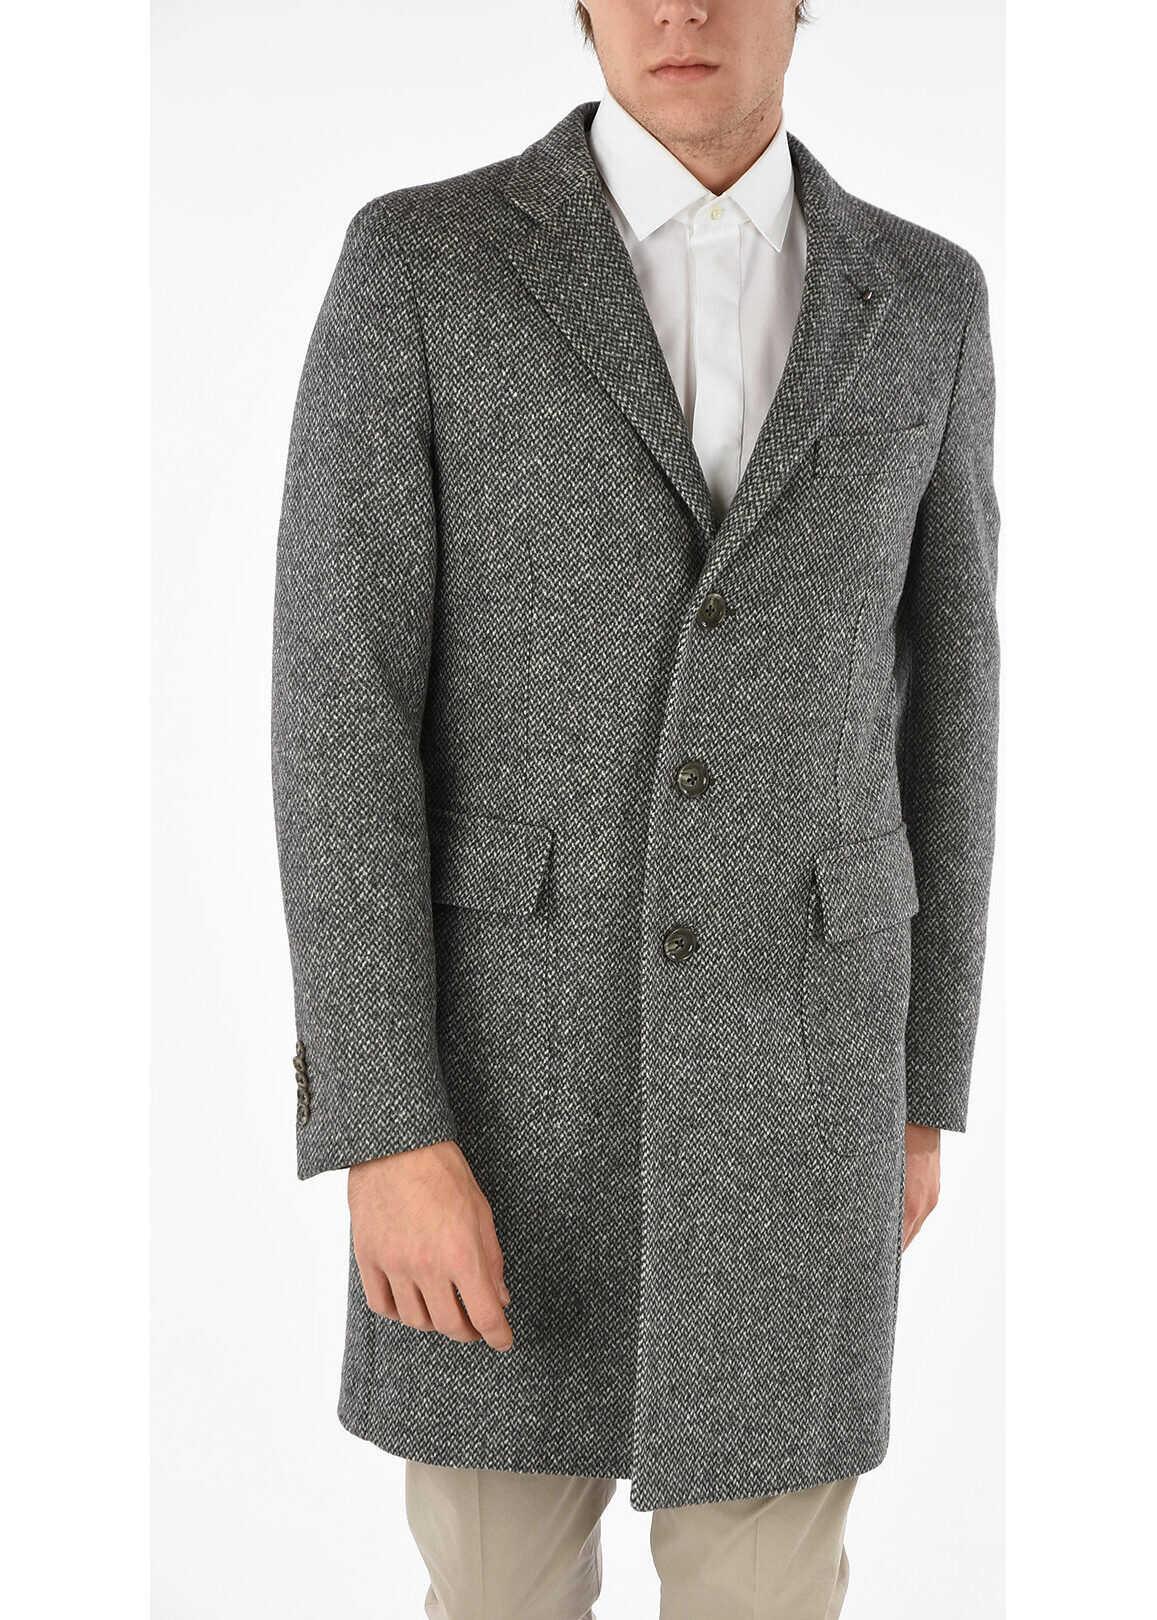 CORNELIANI CC COLLECTION 3 Button Tweed Chesterfield Coat GRAY